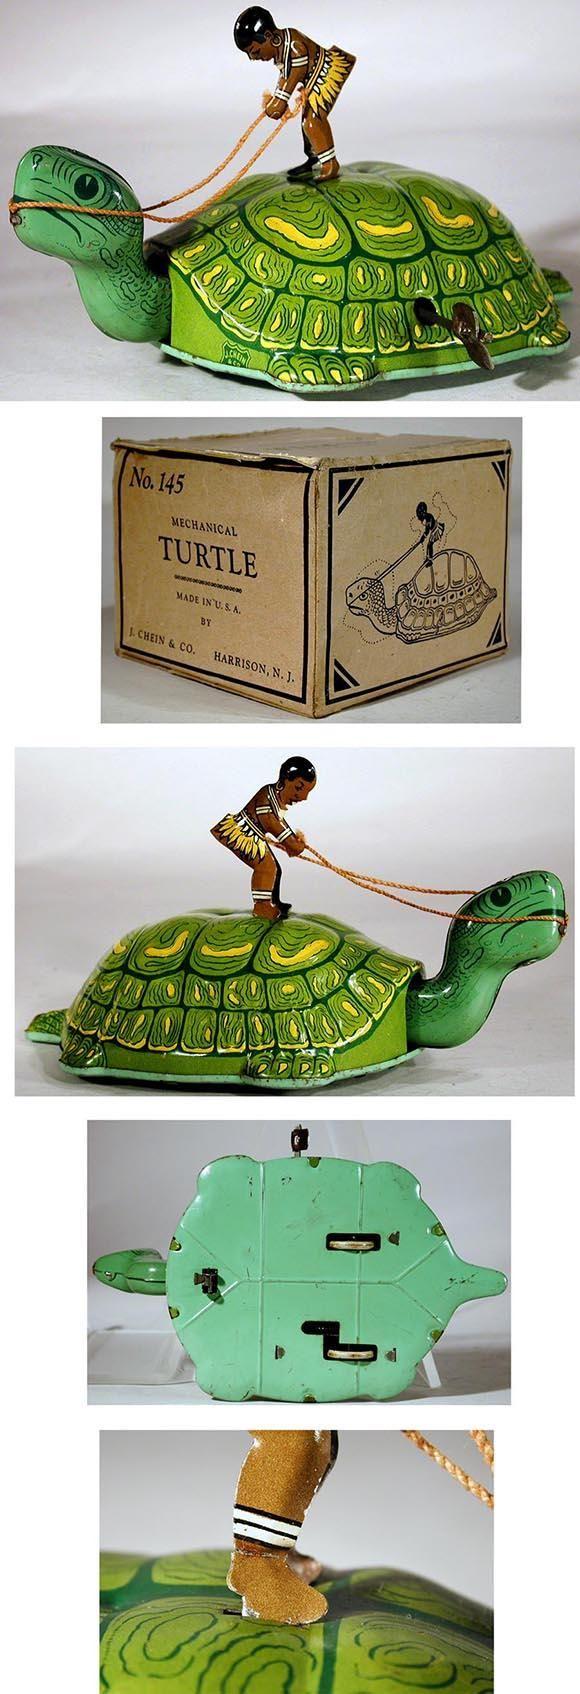 Warning turtles amp tortoises inc - C 1939 Chein No 145 Mechanical Turtle Green In Original Box